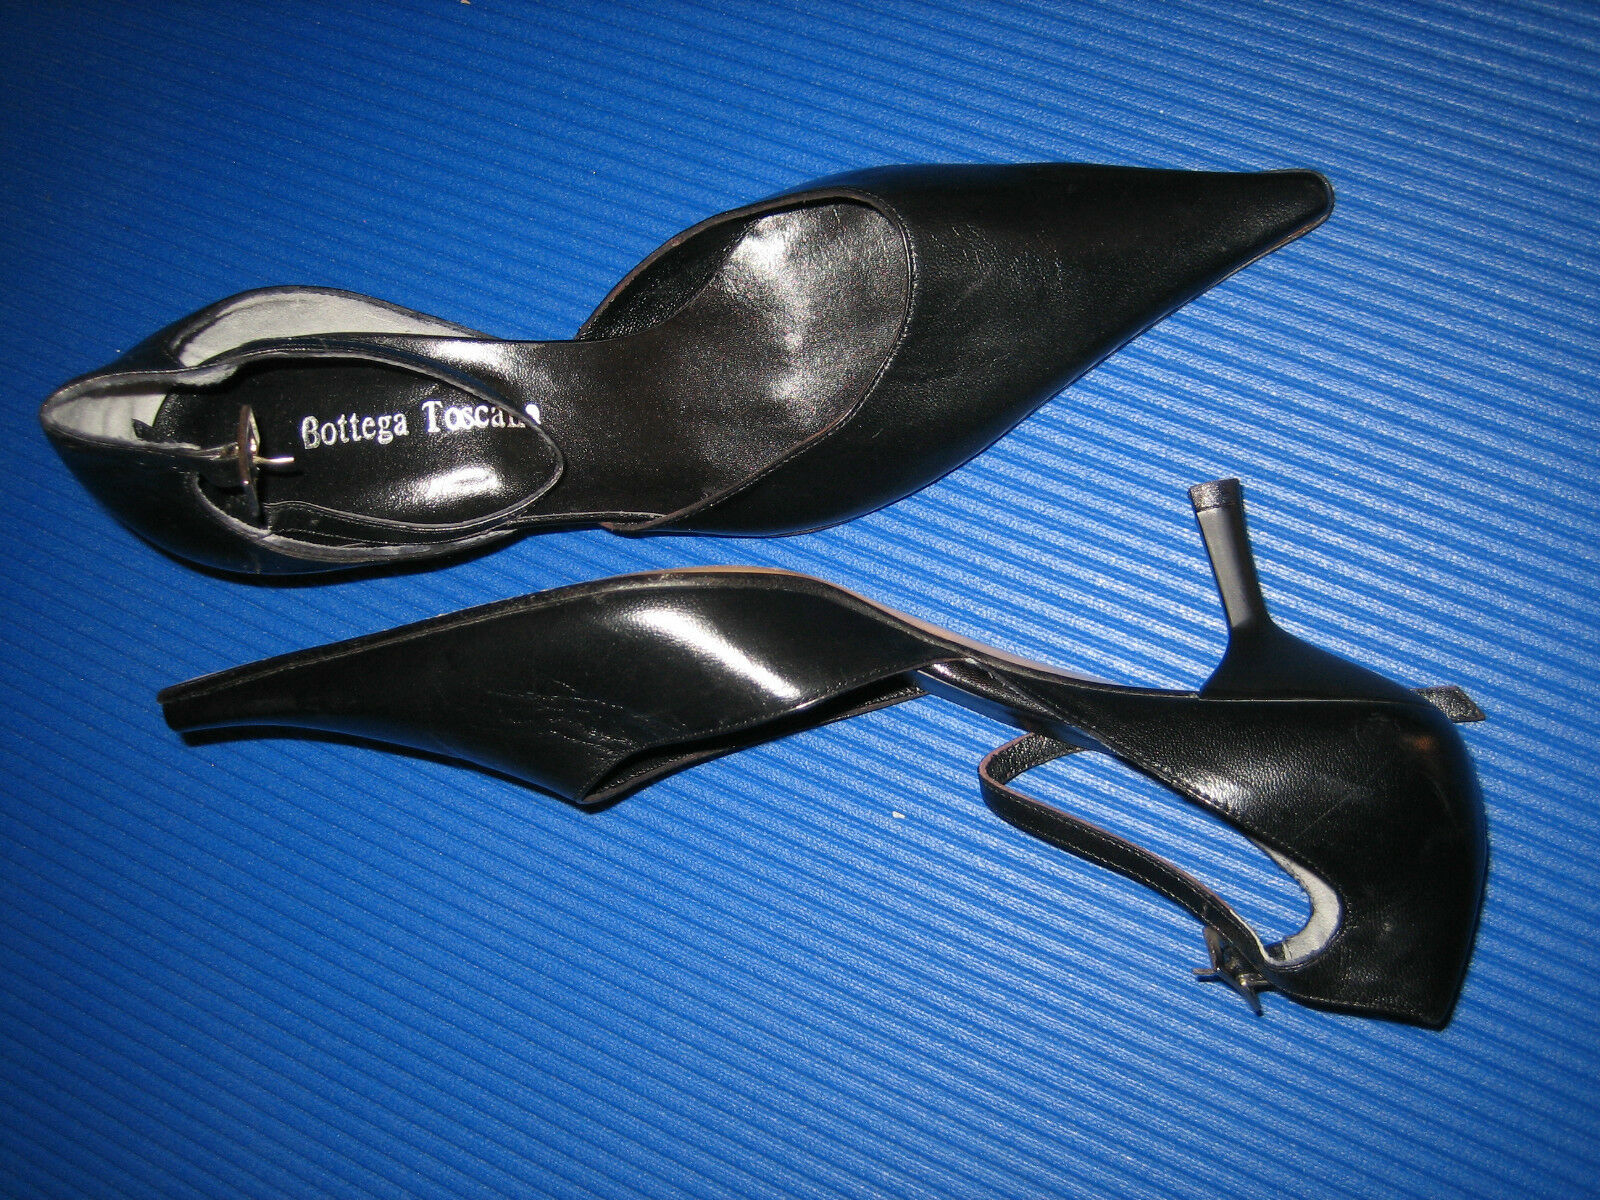 BOTTEGA TOSCANA edle Designer Leder Schuhe Pumps Gr. 38 schwarz NEU und OVP